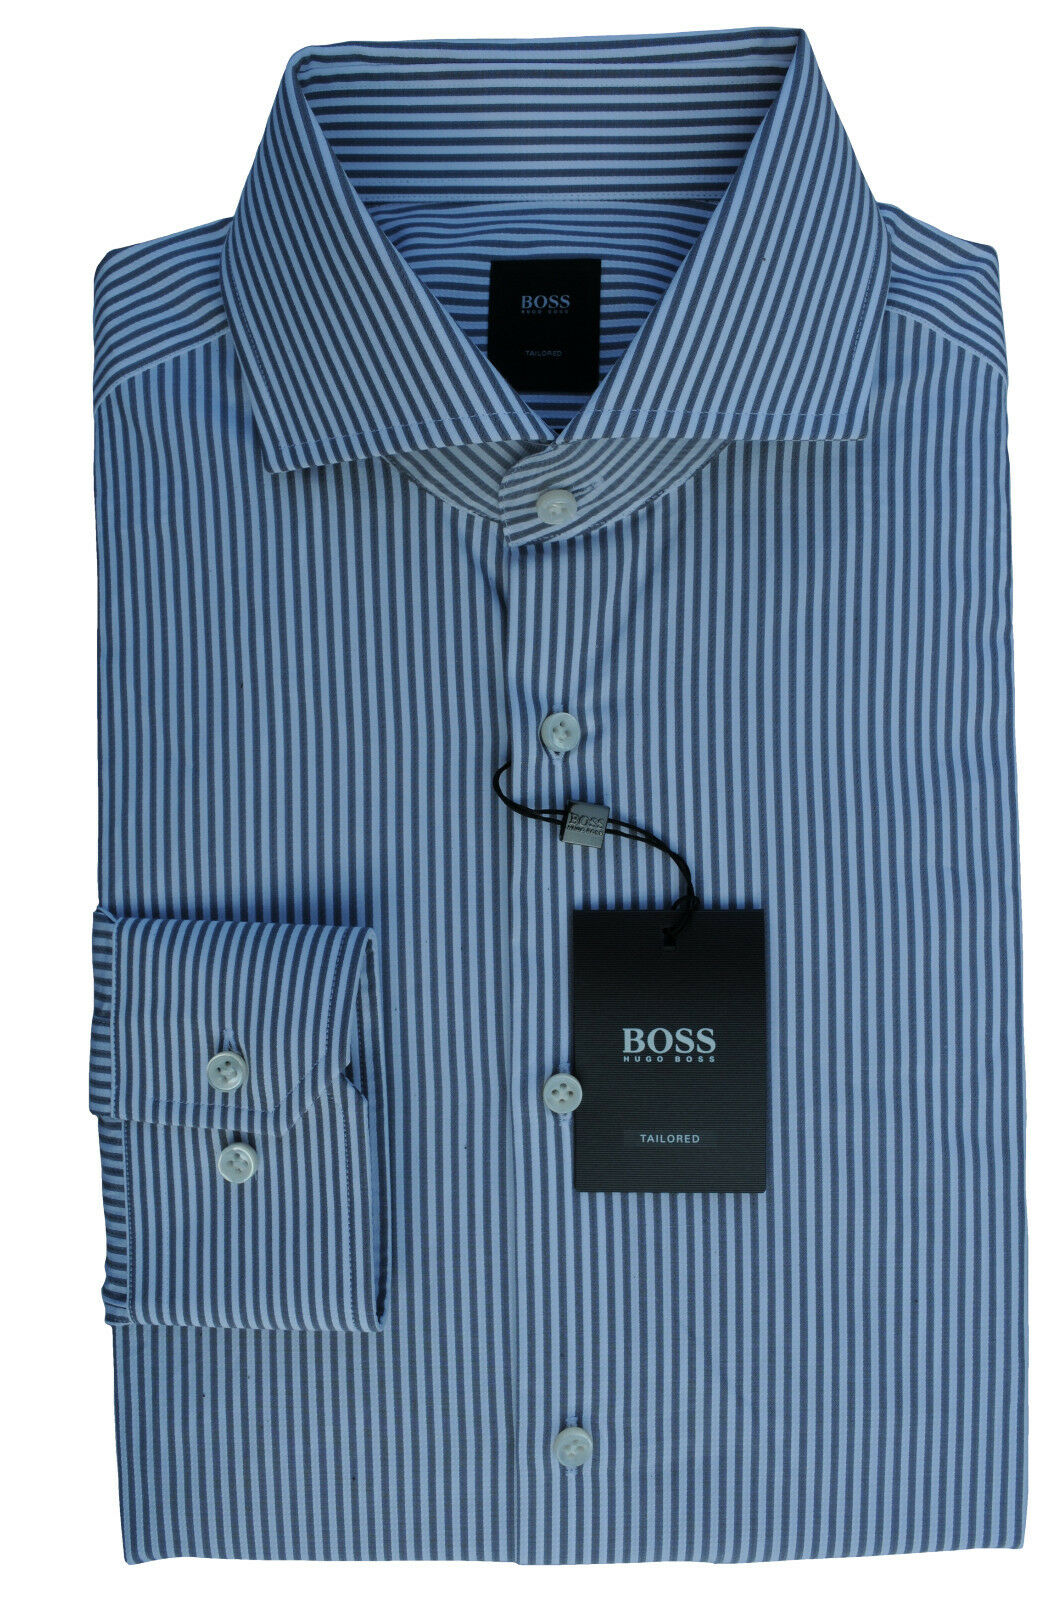 NUOVO Gr. 40 HUGO BOSS JT Christo tailored Camicia Slim Fit Med-grigio JEANS 50370679